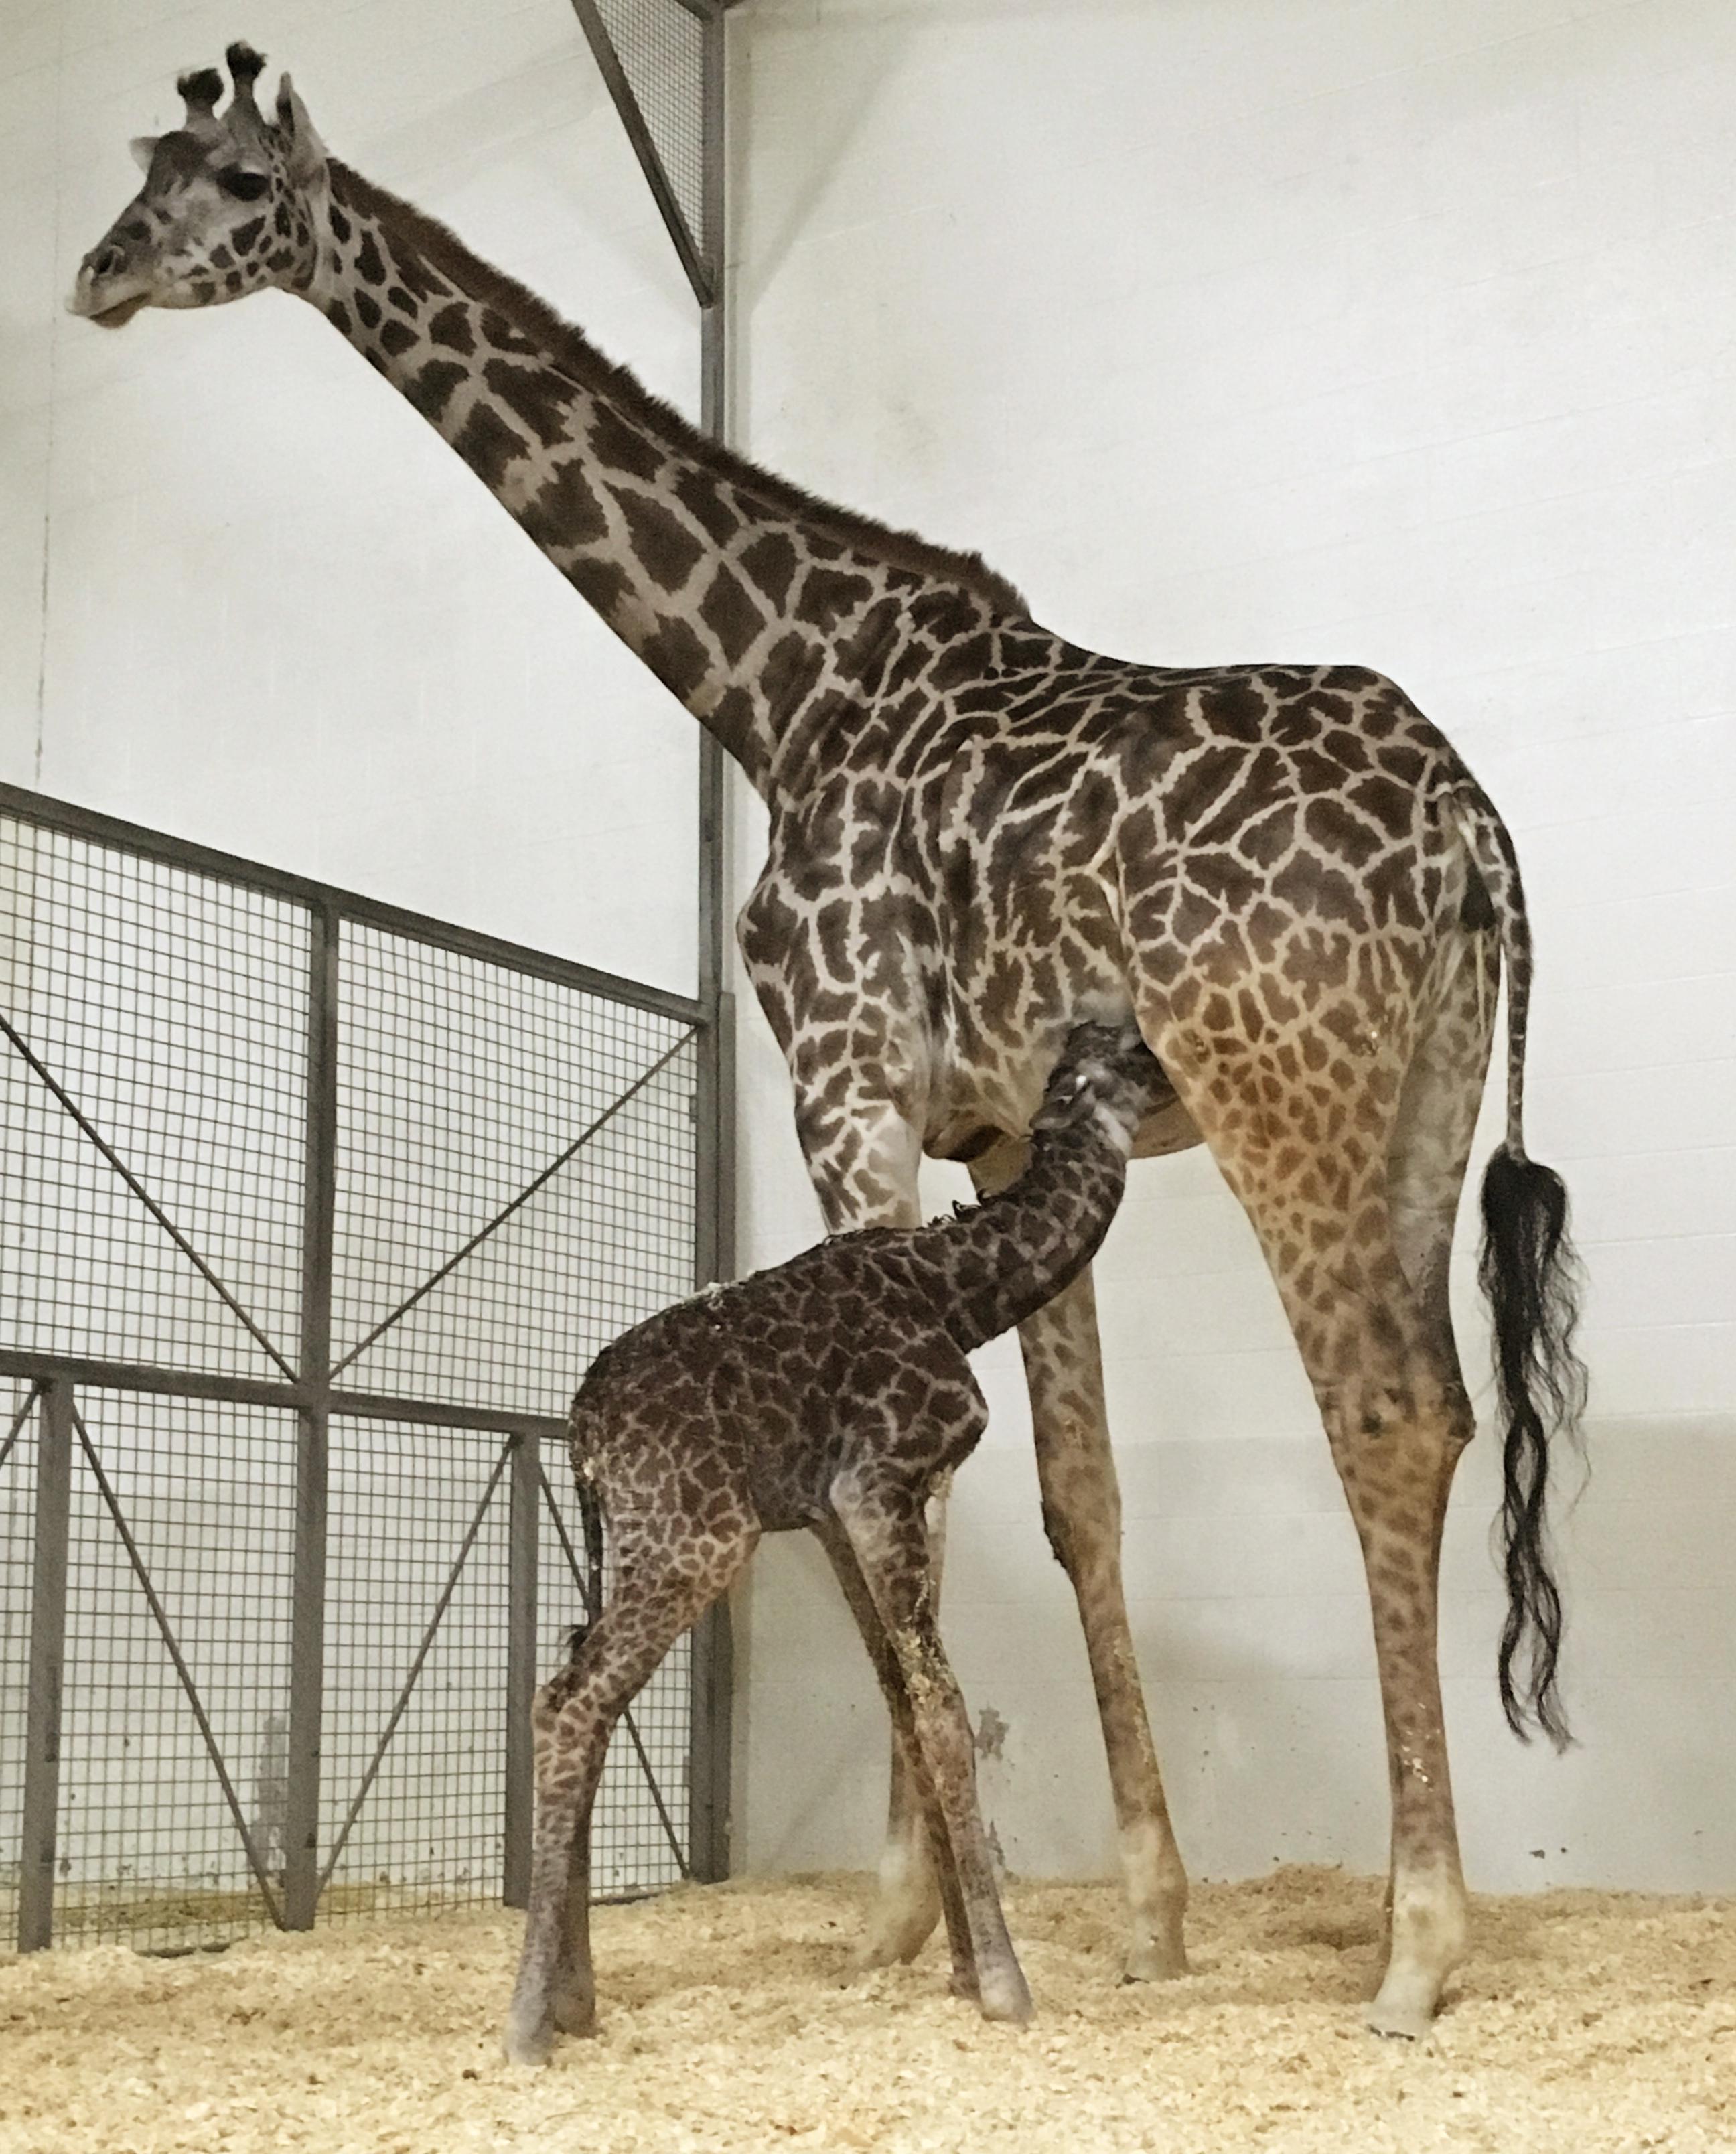 It S Raining Giraffes At The Cincinnati Zoo Cincinnati